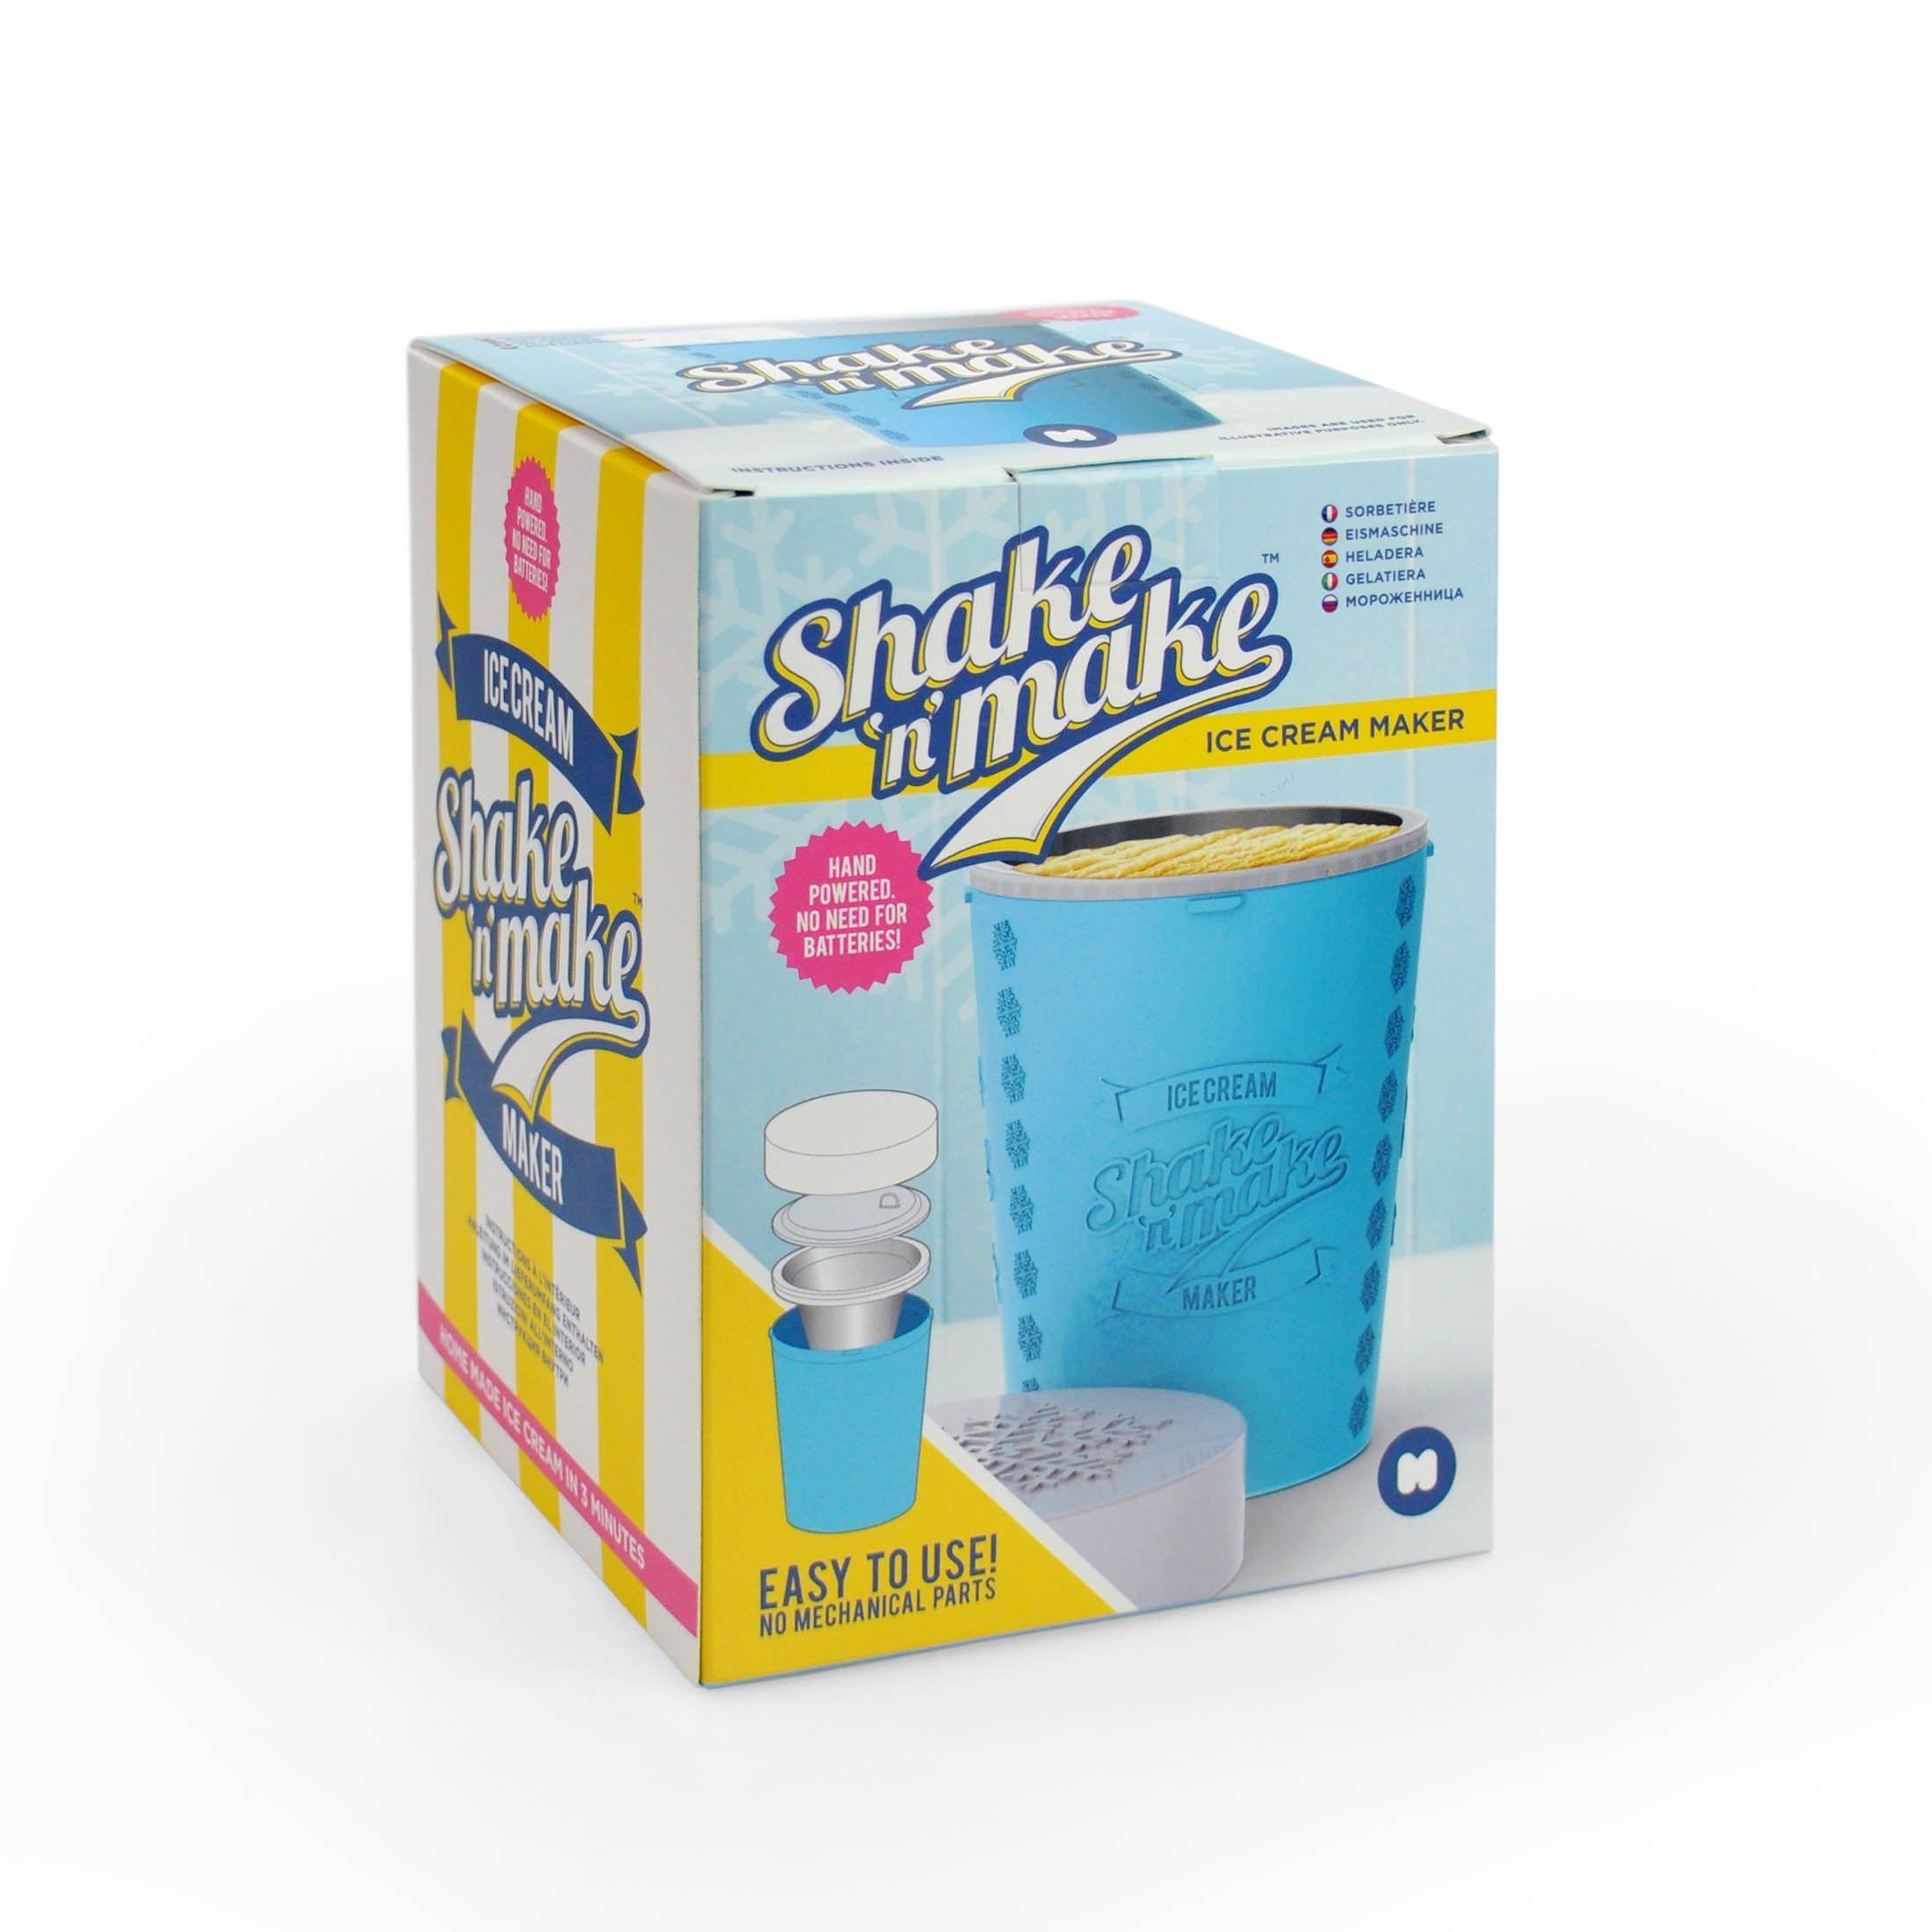 Shake n Make 3 min Ice Cream or Frozen Yoghurt Maker   Treasure ...